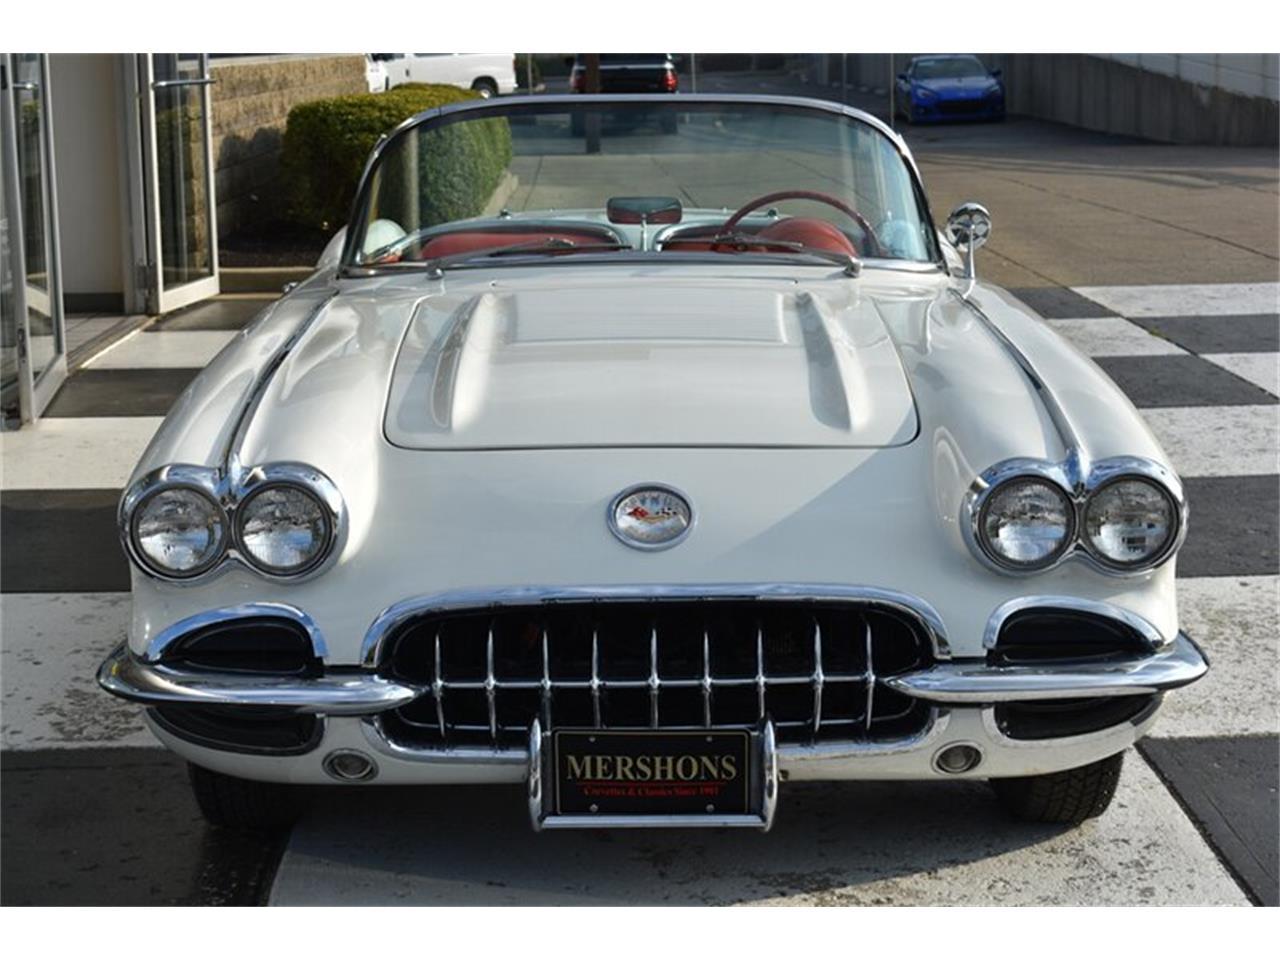 Large Picture of Classic 1958 Corvette located in Ohio - $79,900.00 - R23O